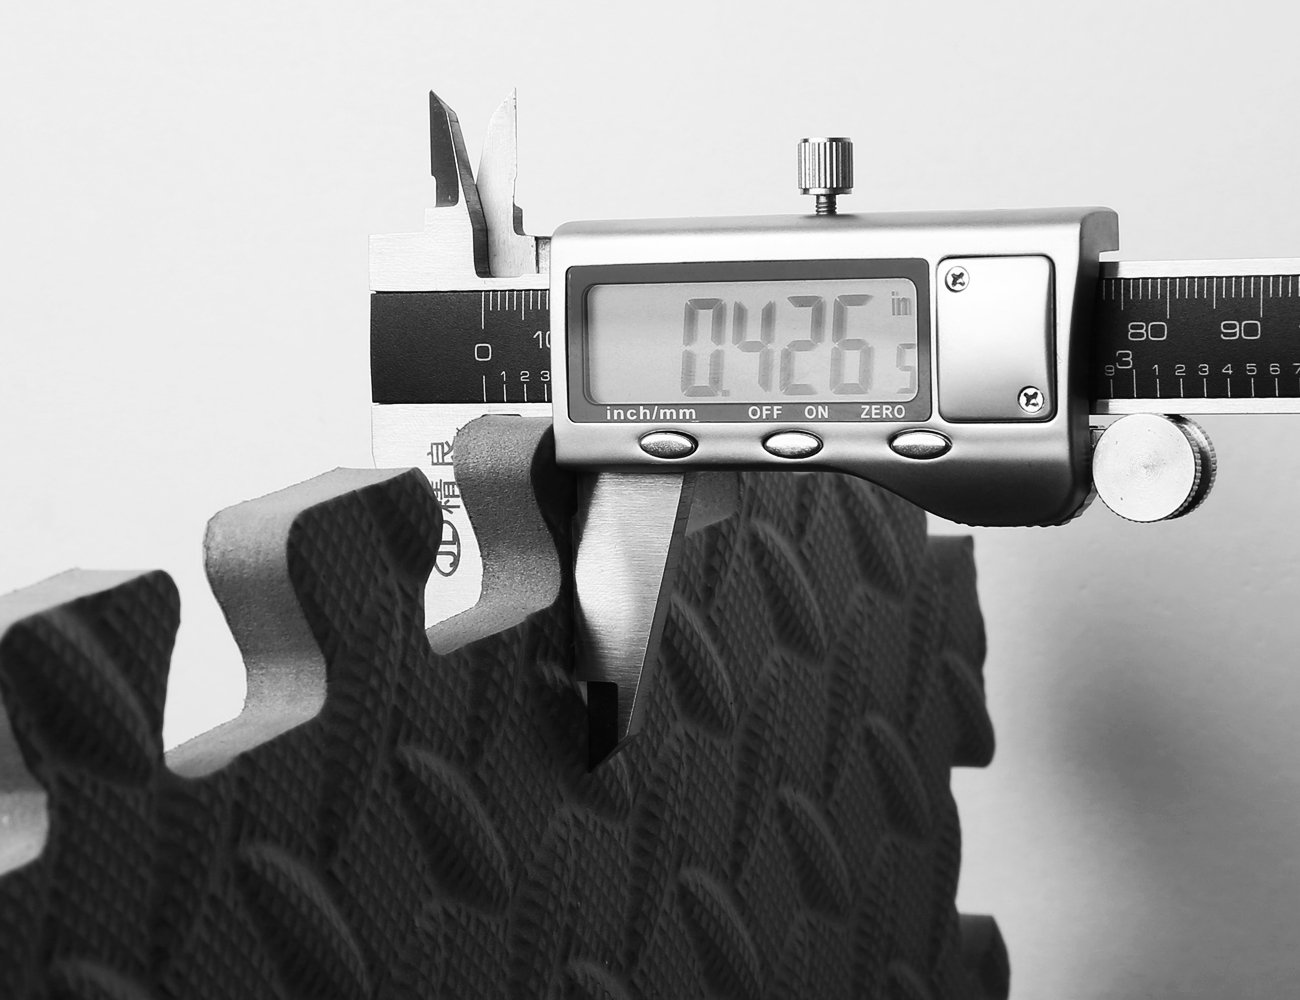 285a4c3290e80 innhom Gym Mat Puzzle Exercise Mats Gym Flooring Mat Interlocking ...